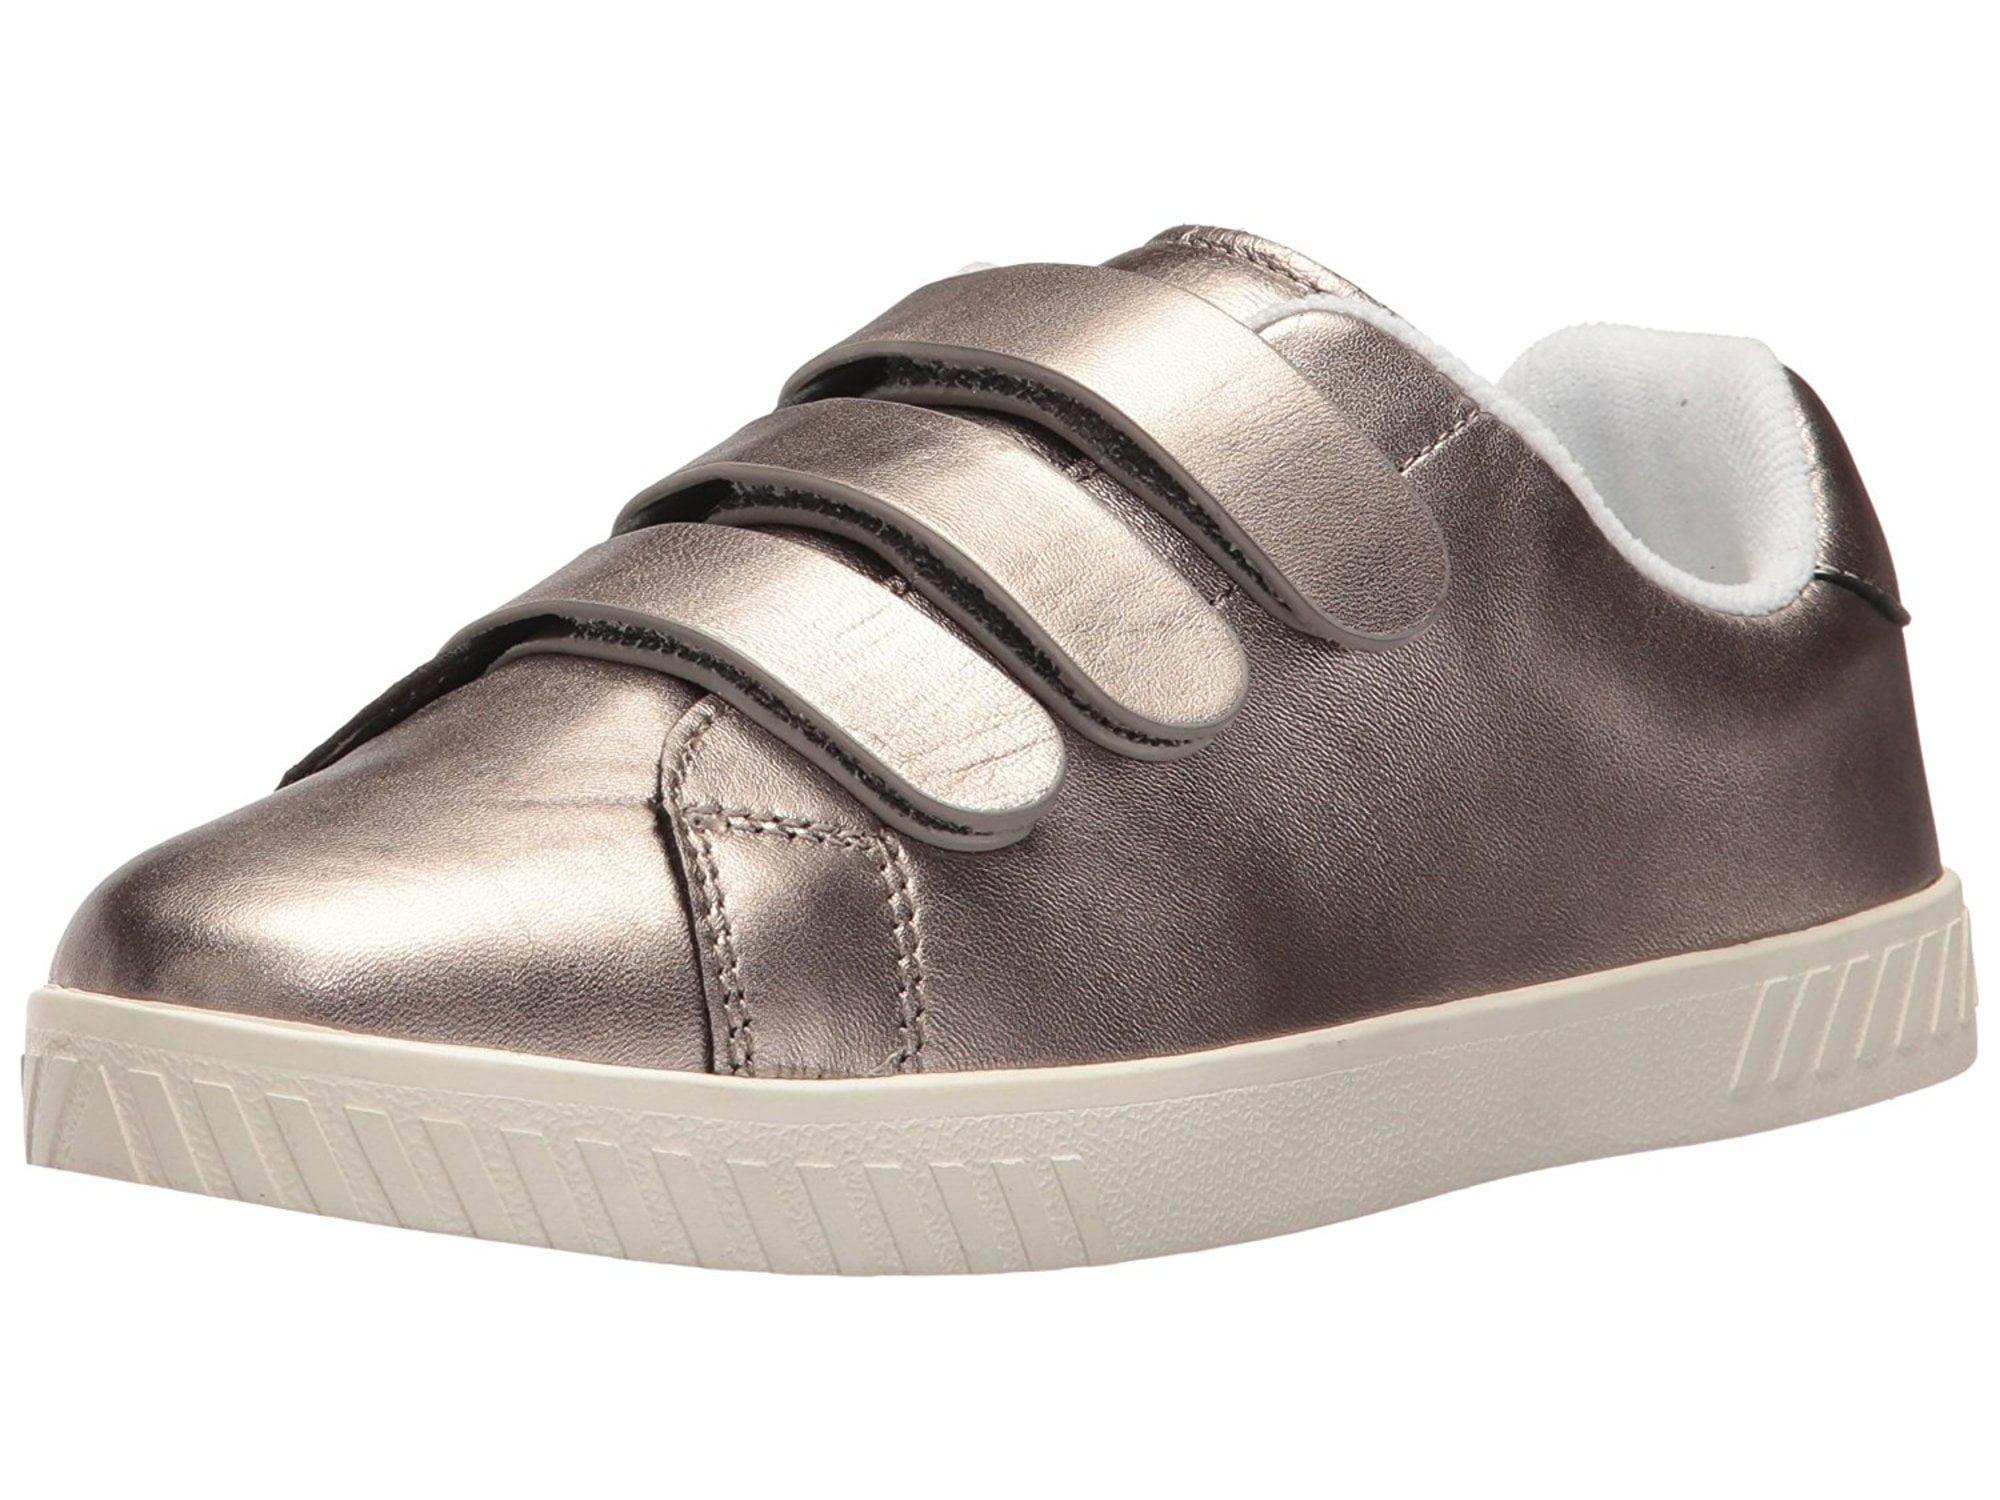 Tretorn Women's Carry2 Sneaker by Tretorn